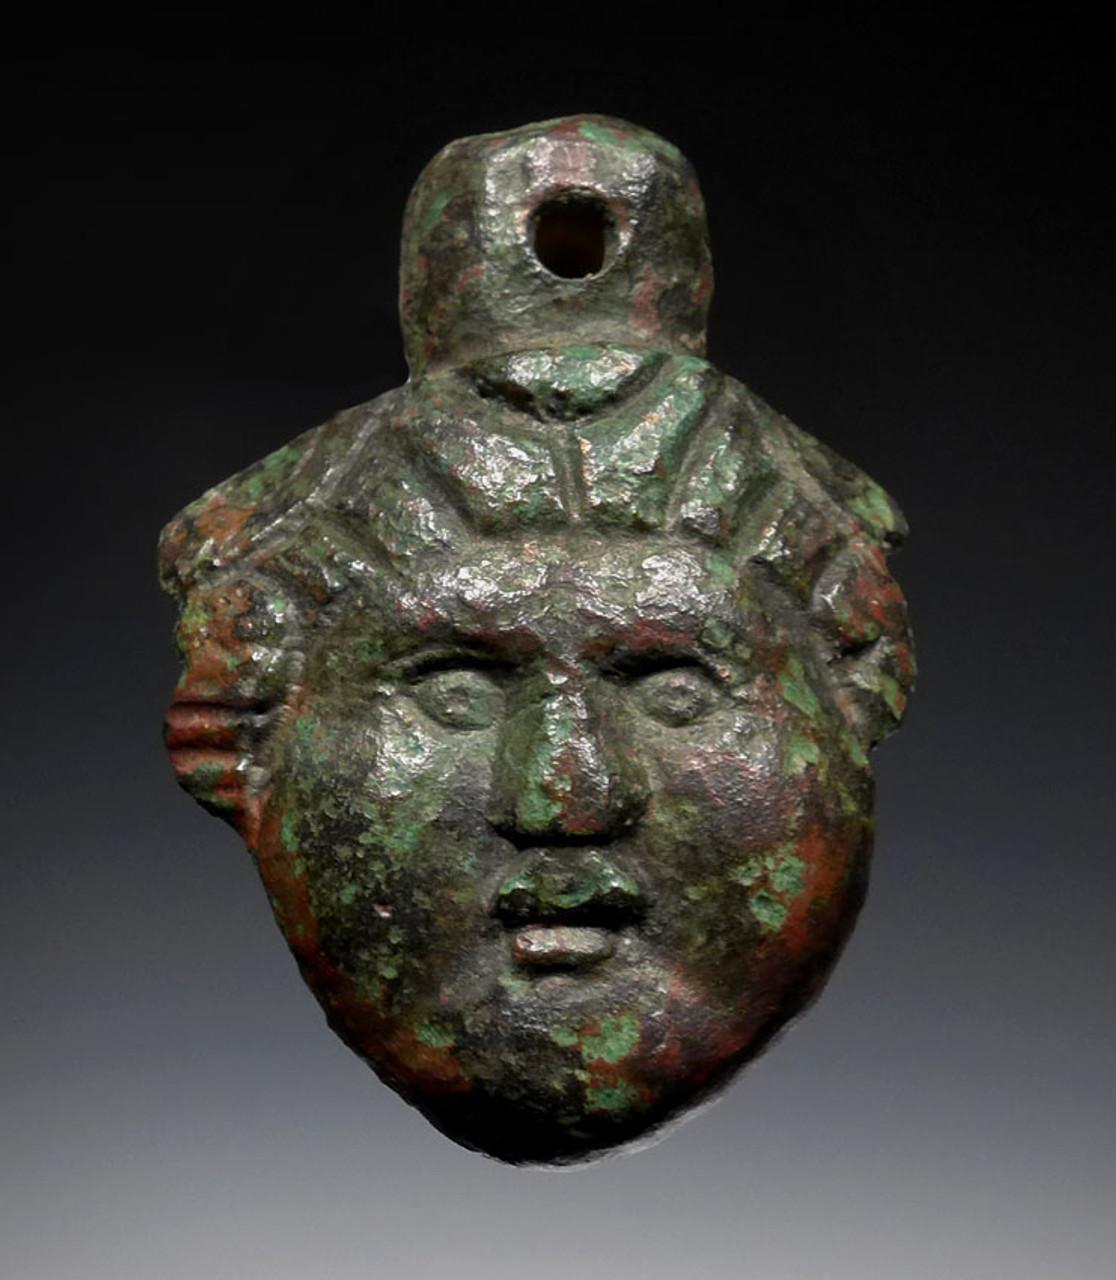 R156 - SUPERB EARLY ANCIENT ROMAN BRONZE DIANA GODDESS PENDANT